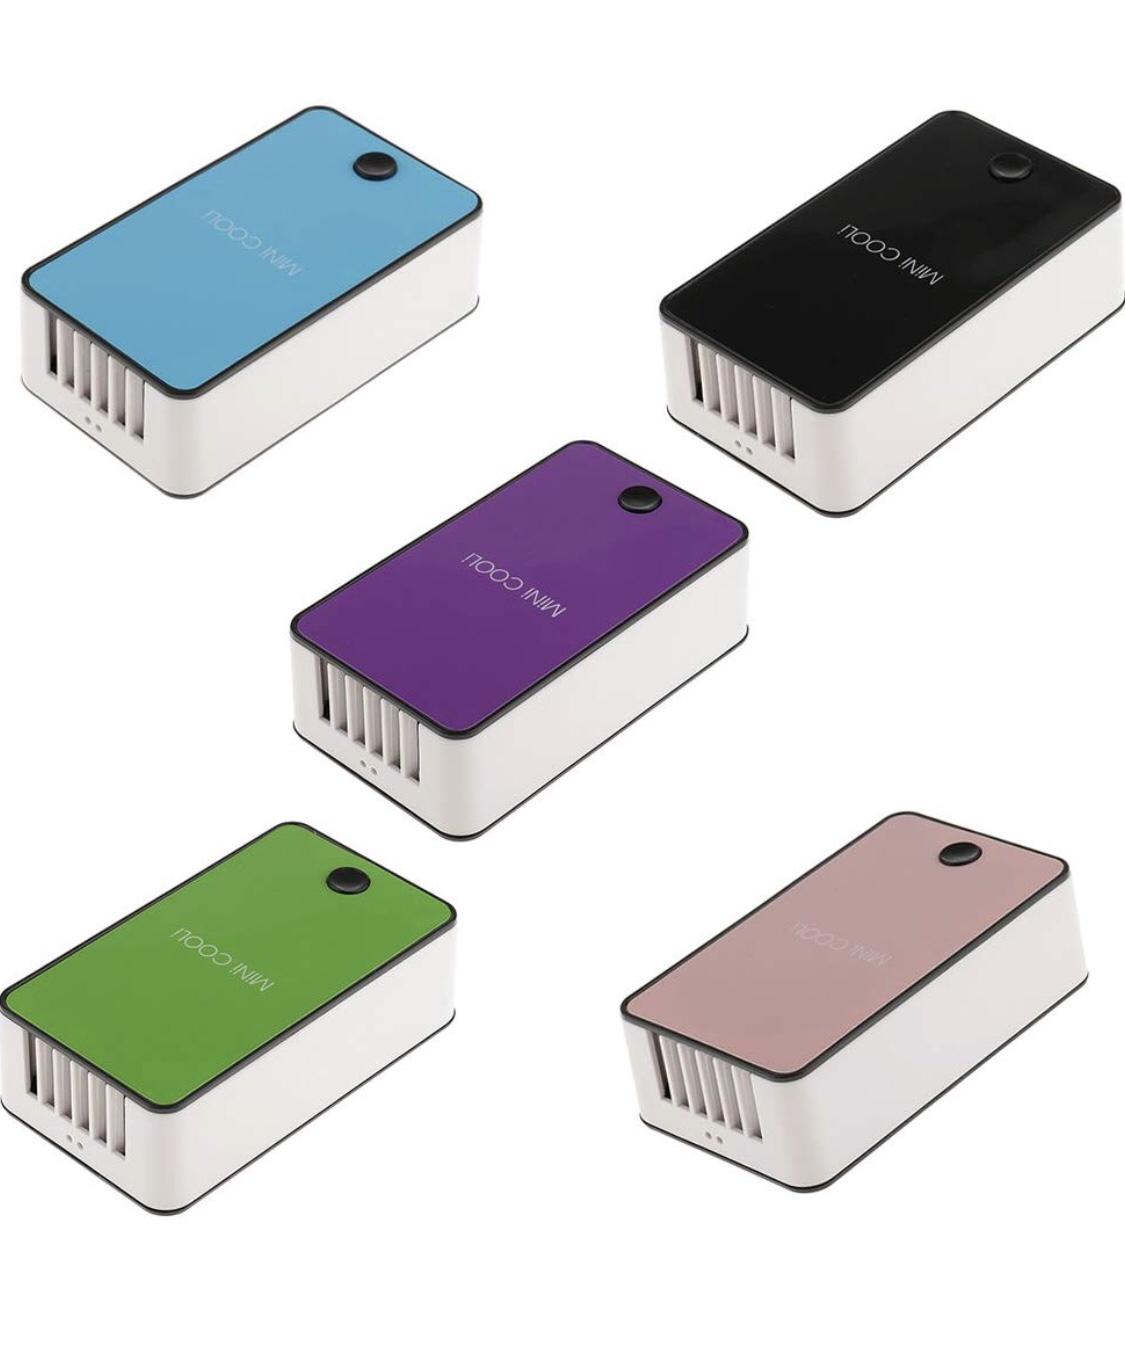 MagiDeal Mini USB Eyelash Extension Adhesive Glue Grafting Air Conditioning Fan Individual Eye Lash Blower Quick Blowing Dryer